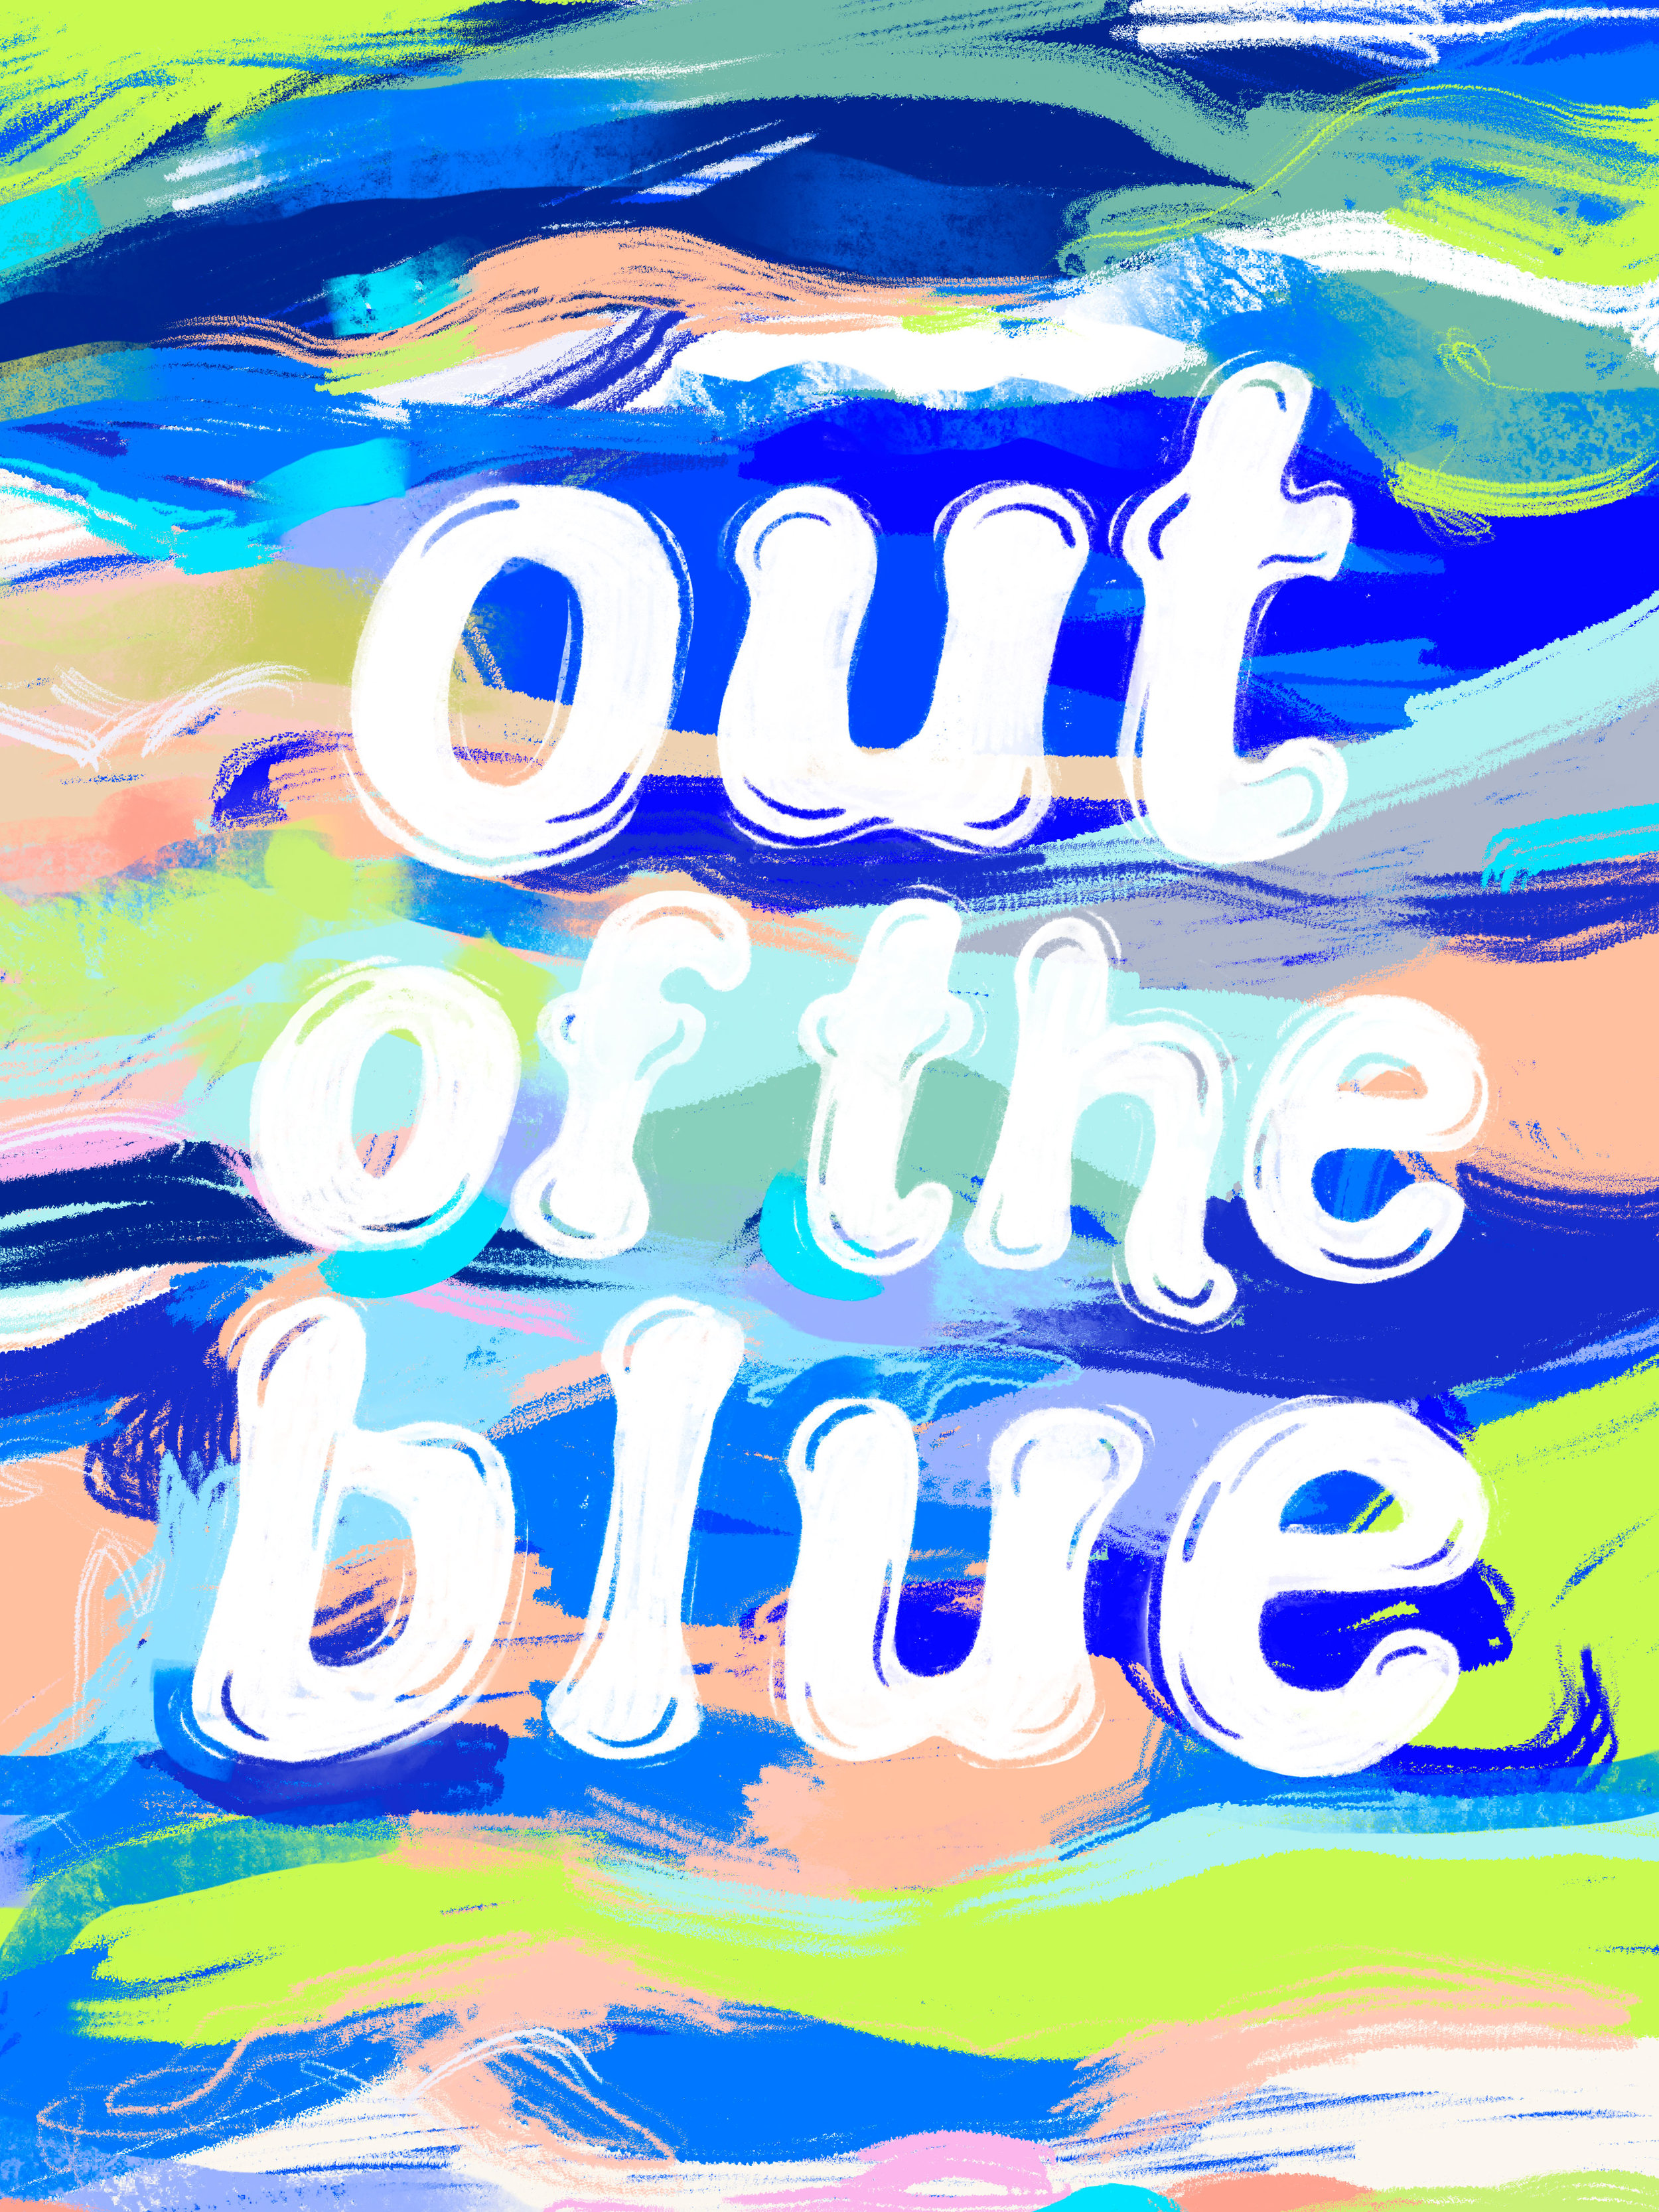 ALL_OutoftheBlue.jpg